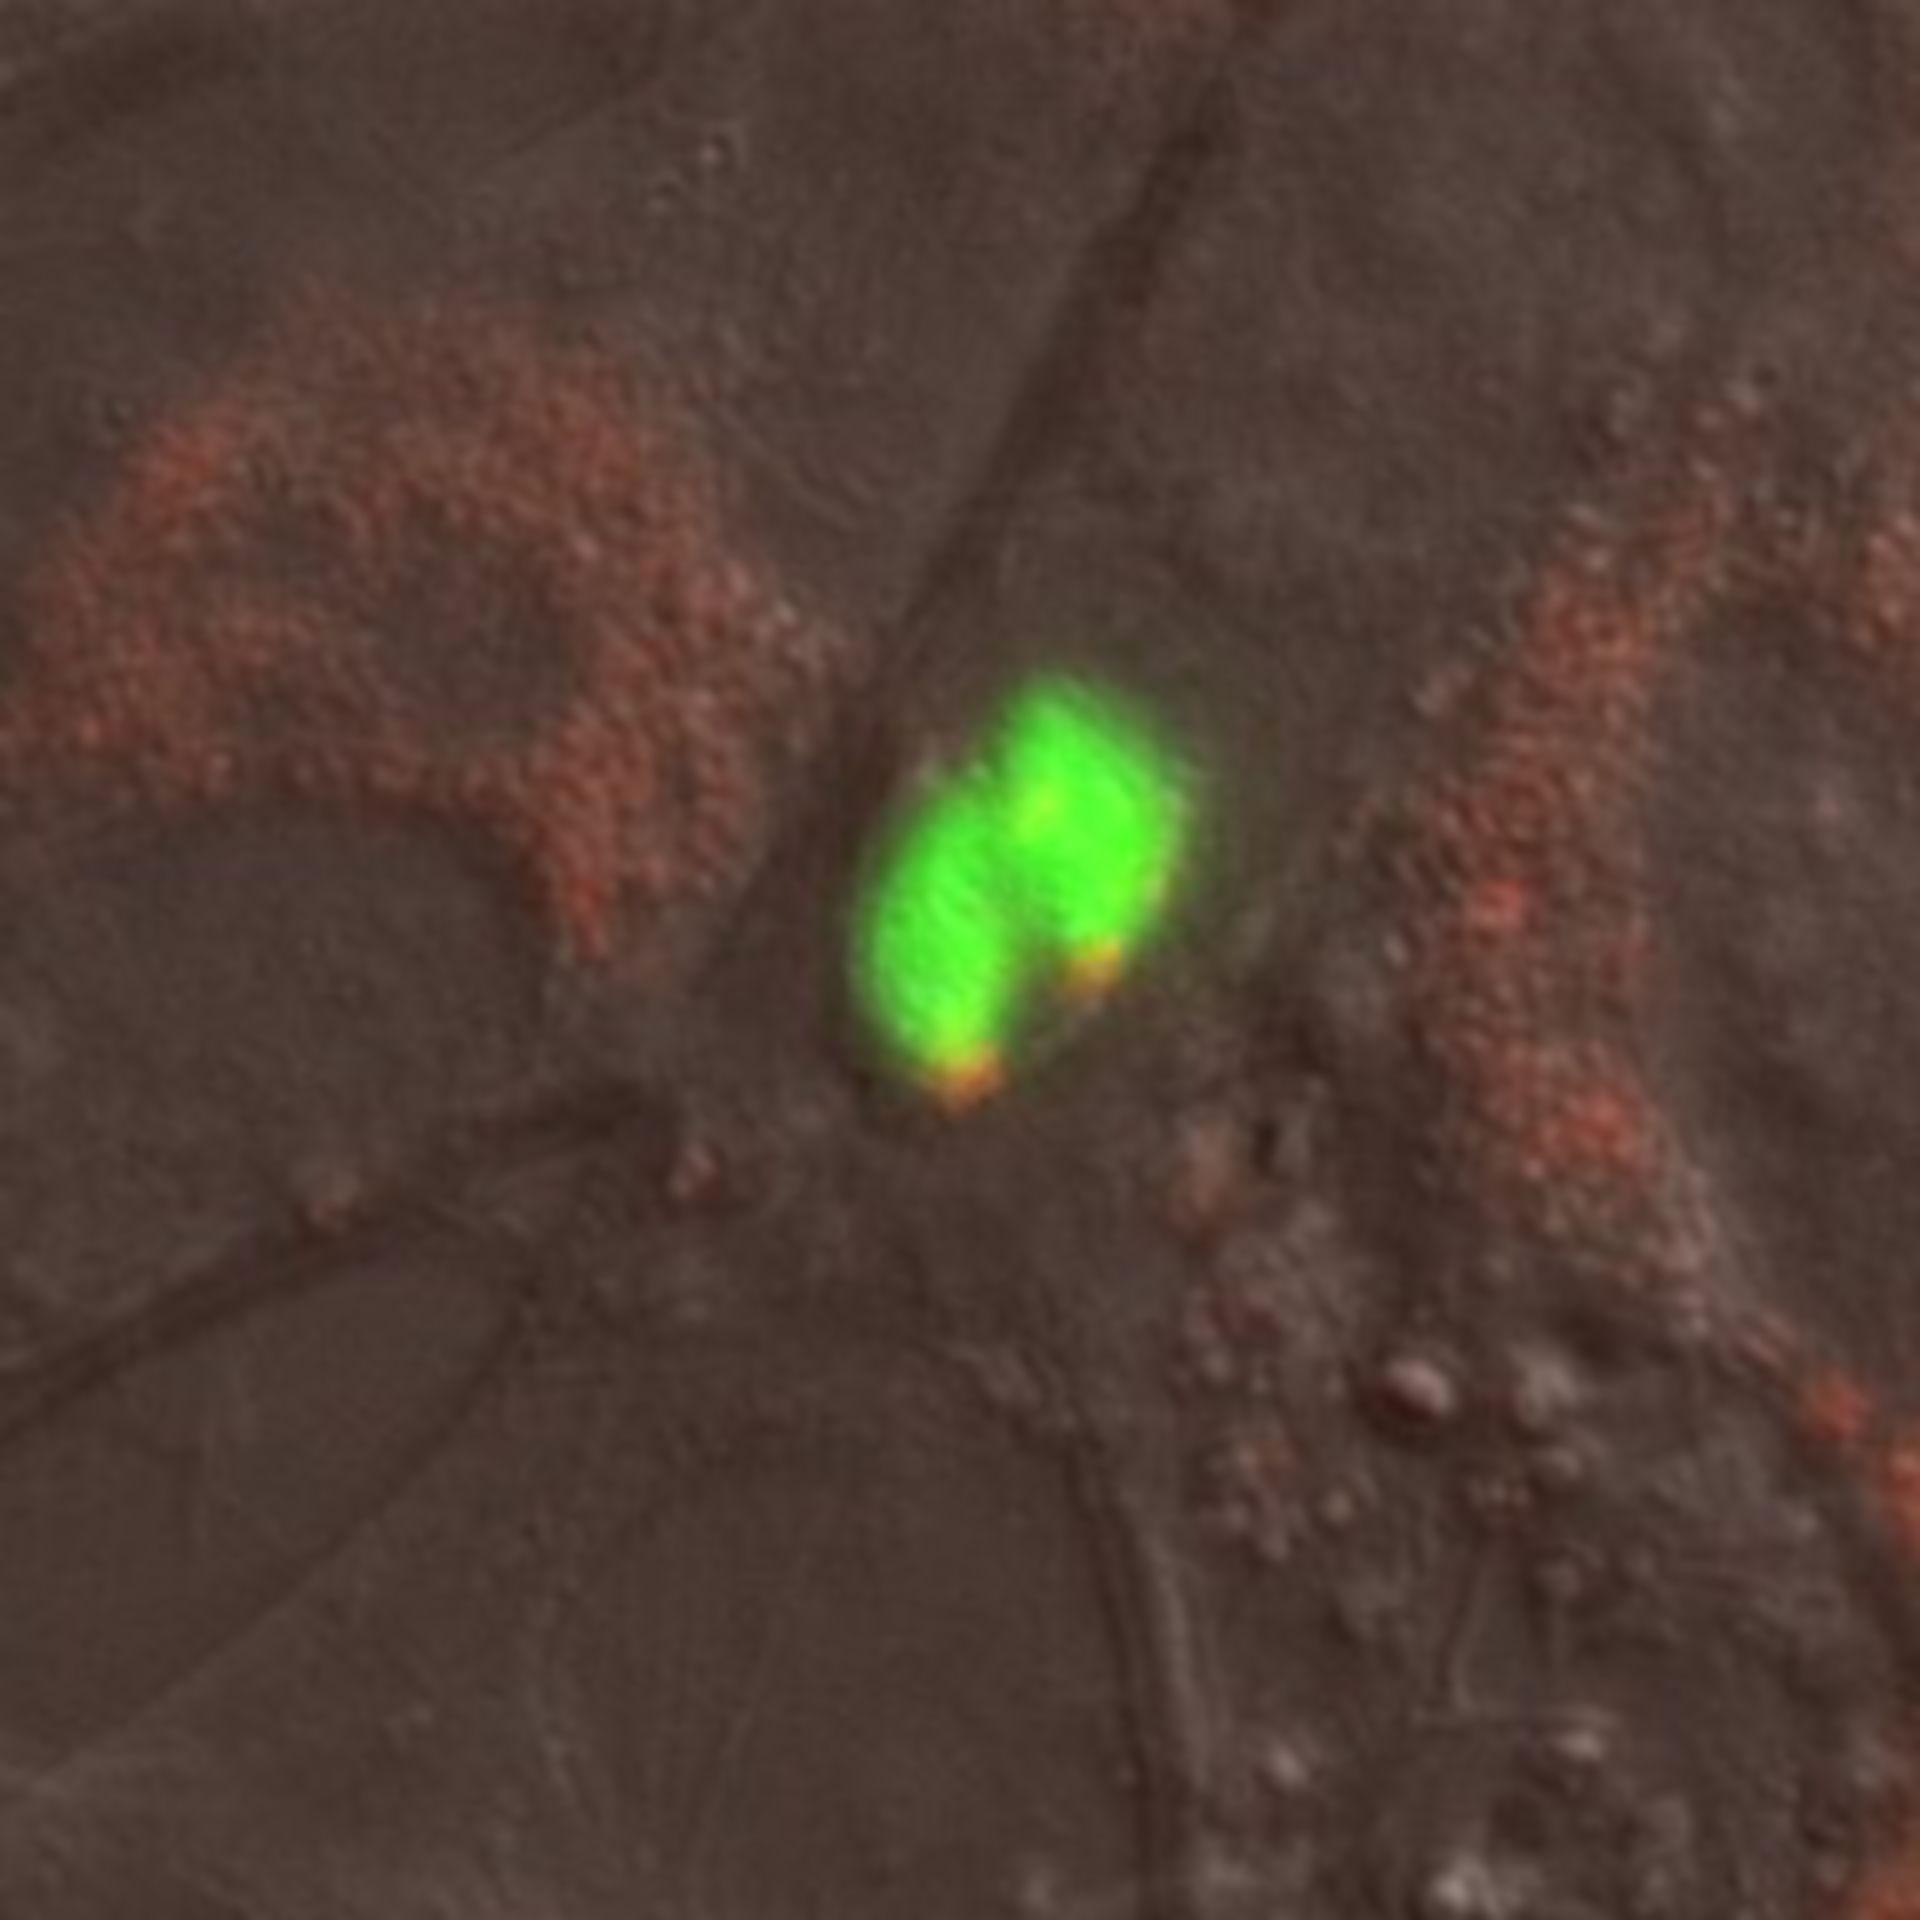 Toxoplasma gondii RH (Microtubule organizing center) - CIL:10460